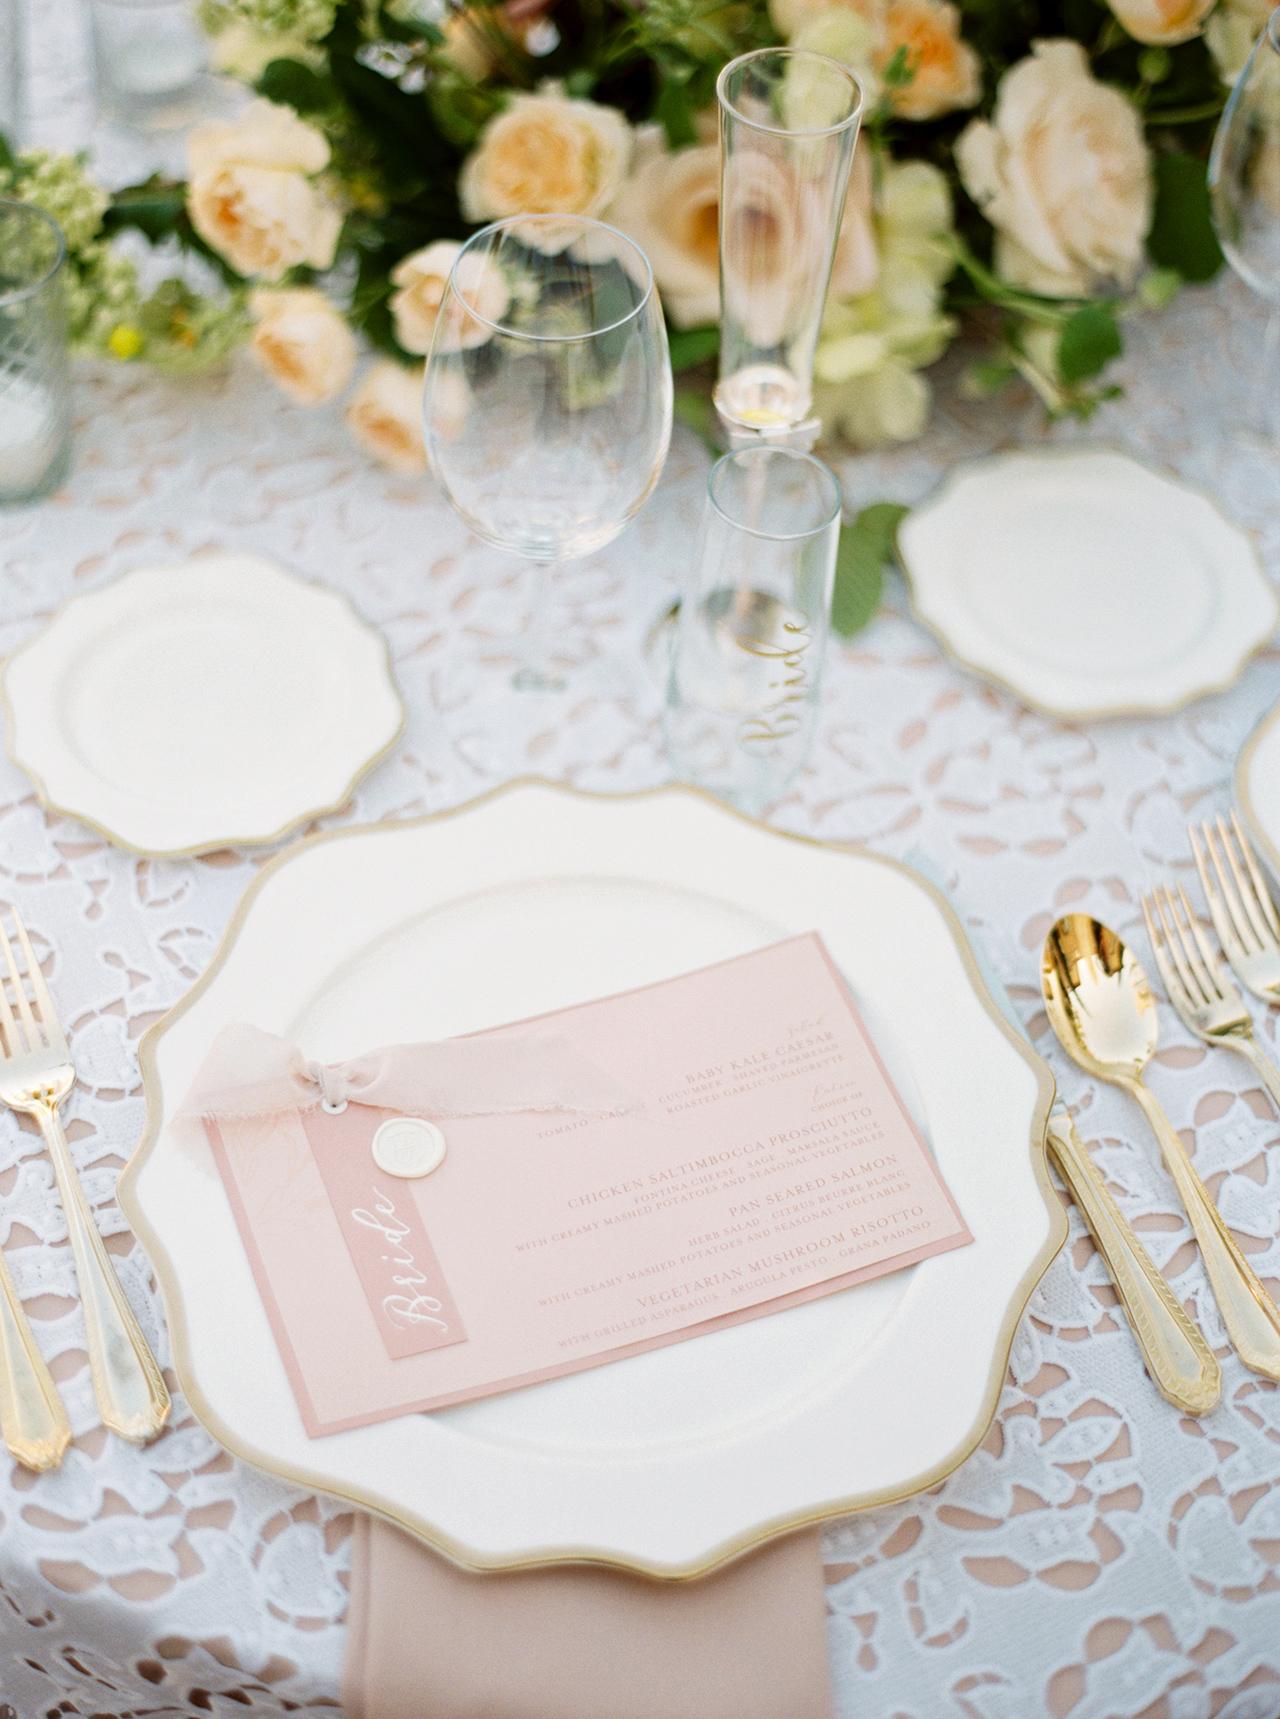 wedding reception blush-hued place setting menu